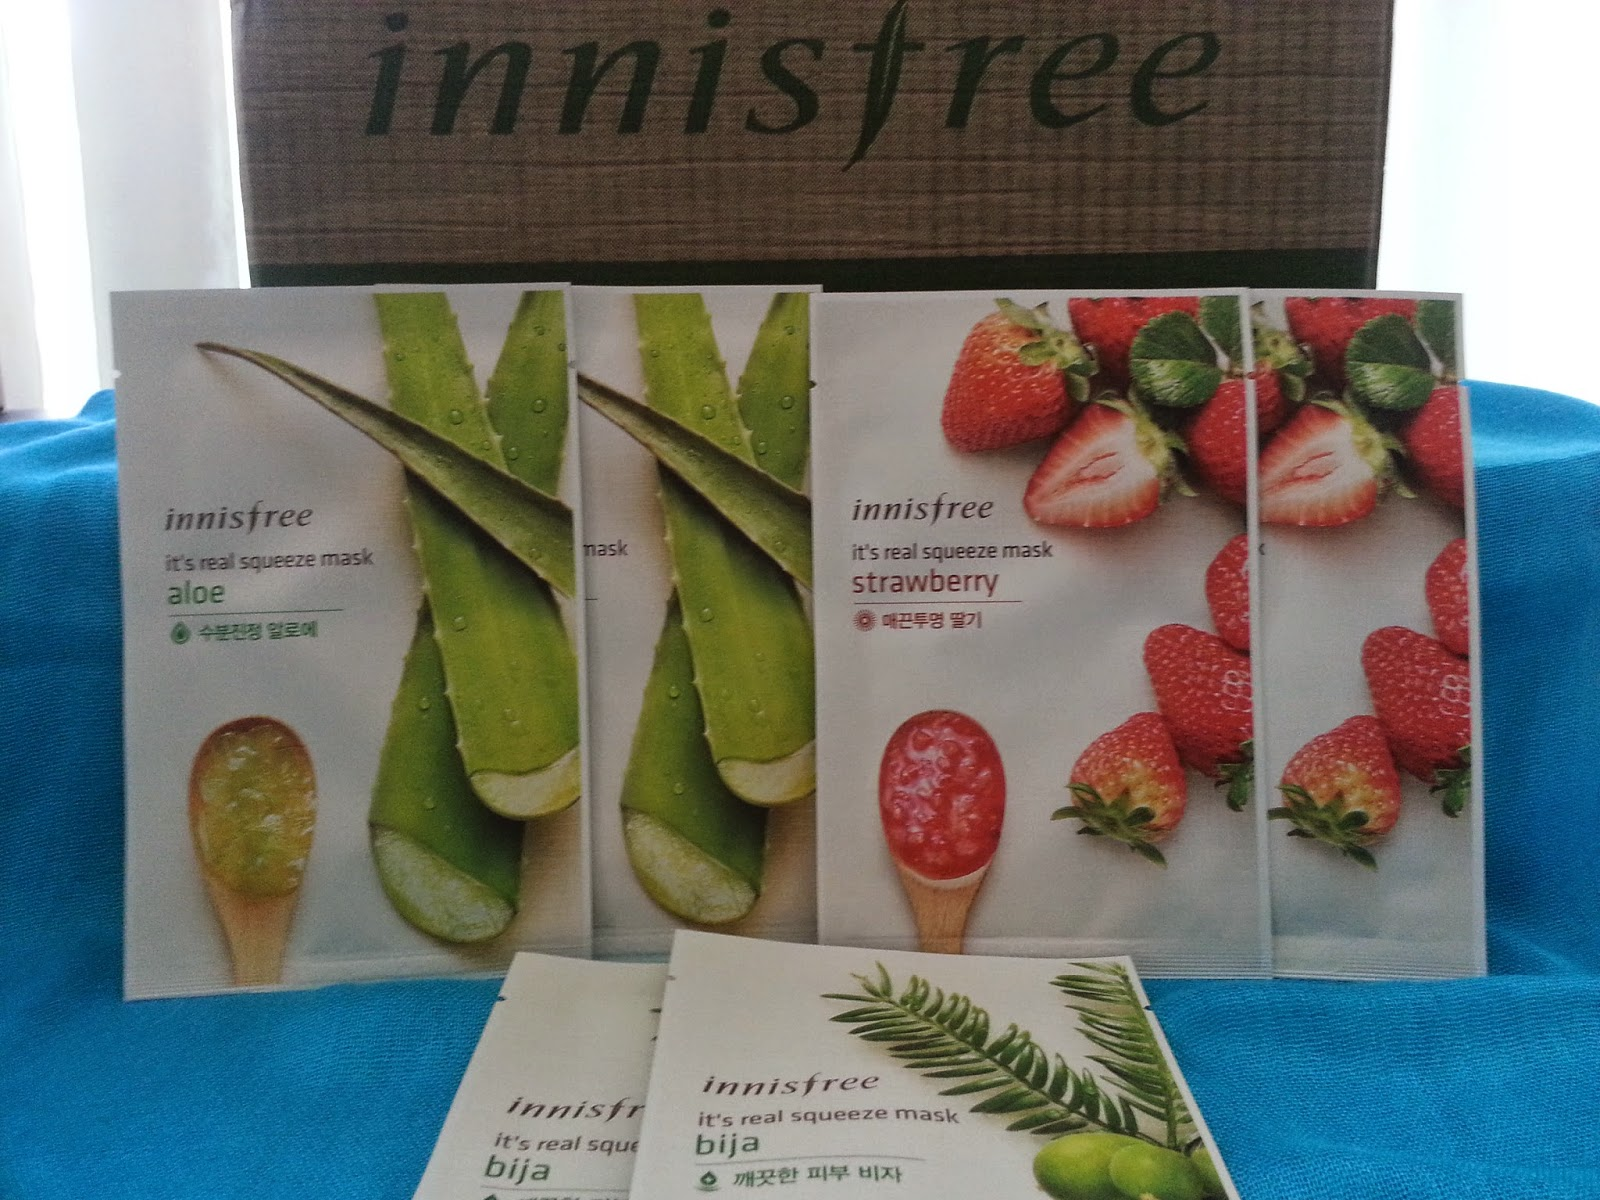 Aloe, Strawberry, Bija sheet masks